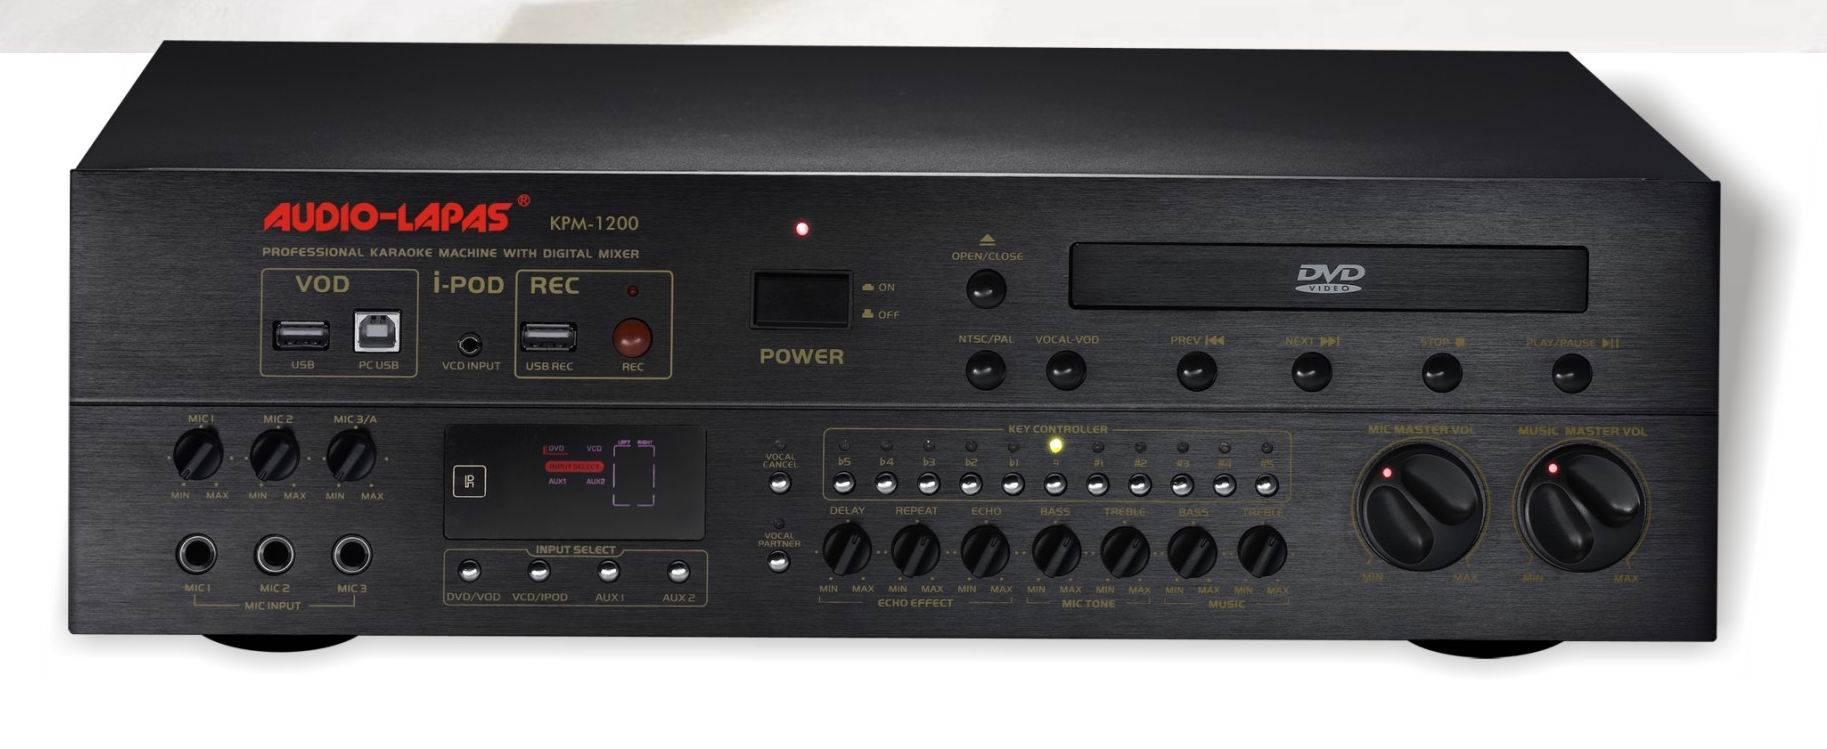 HDD Karaoke player with digital mixer